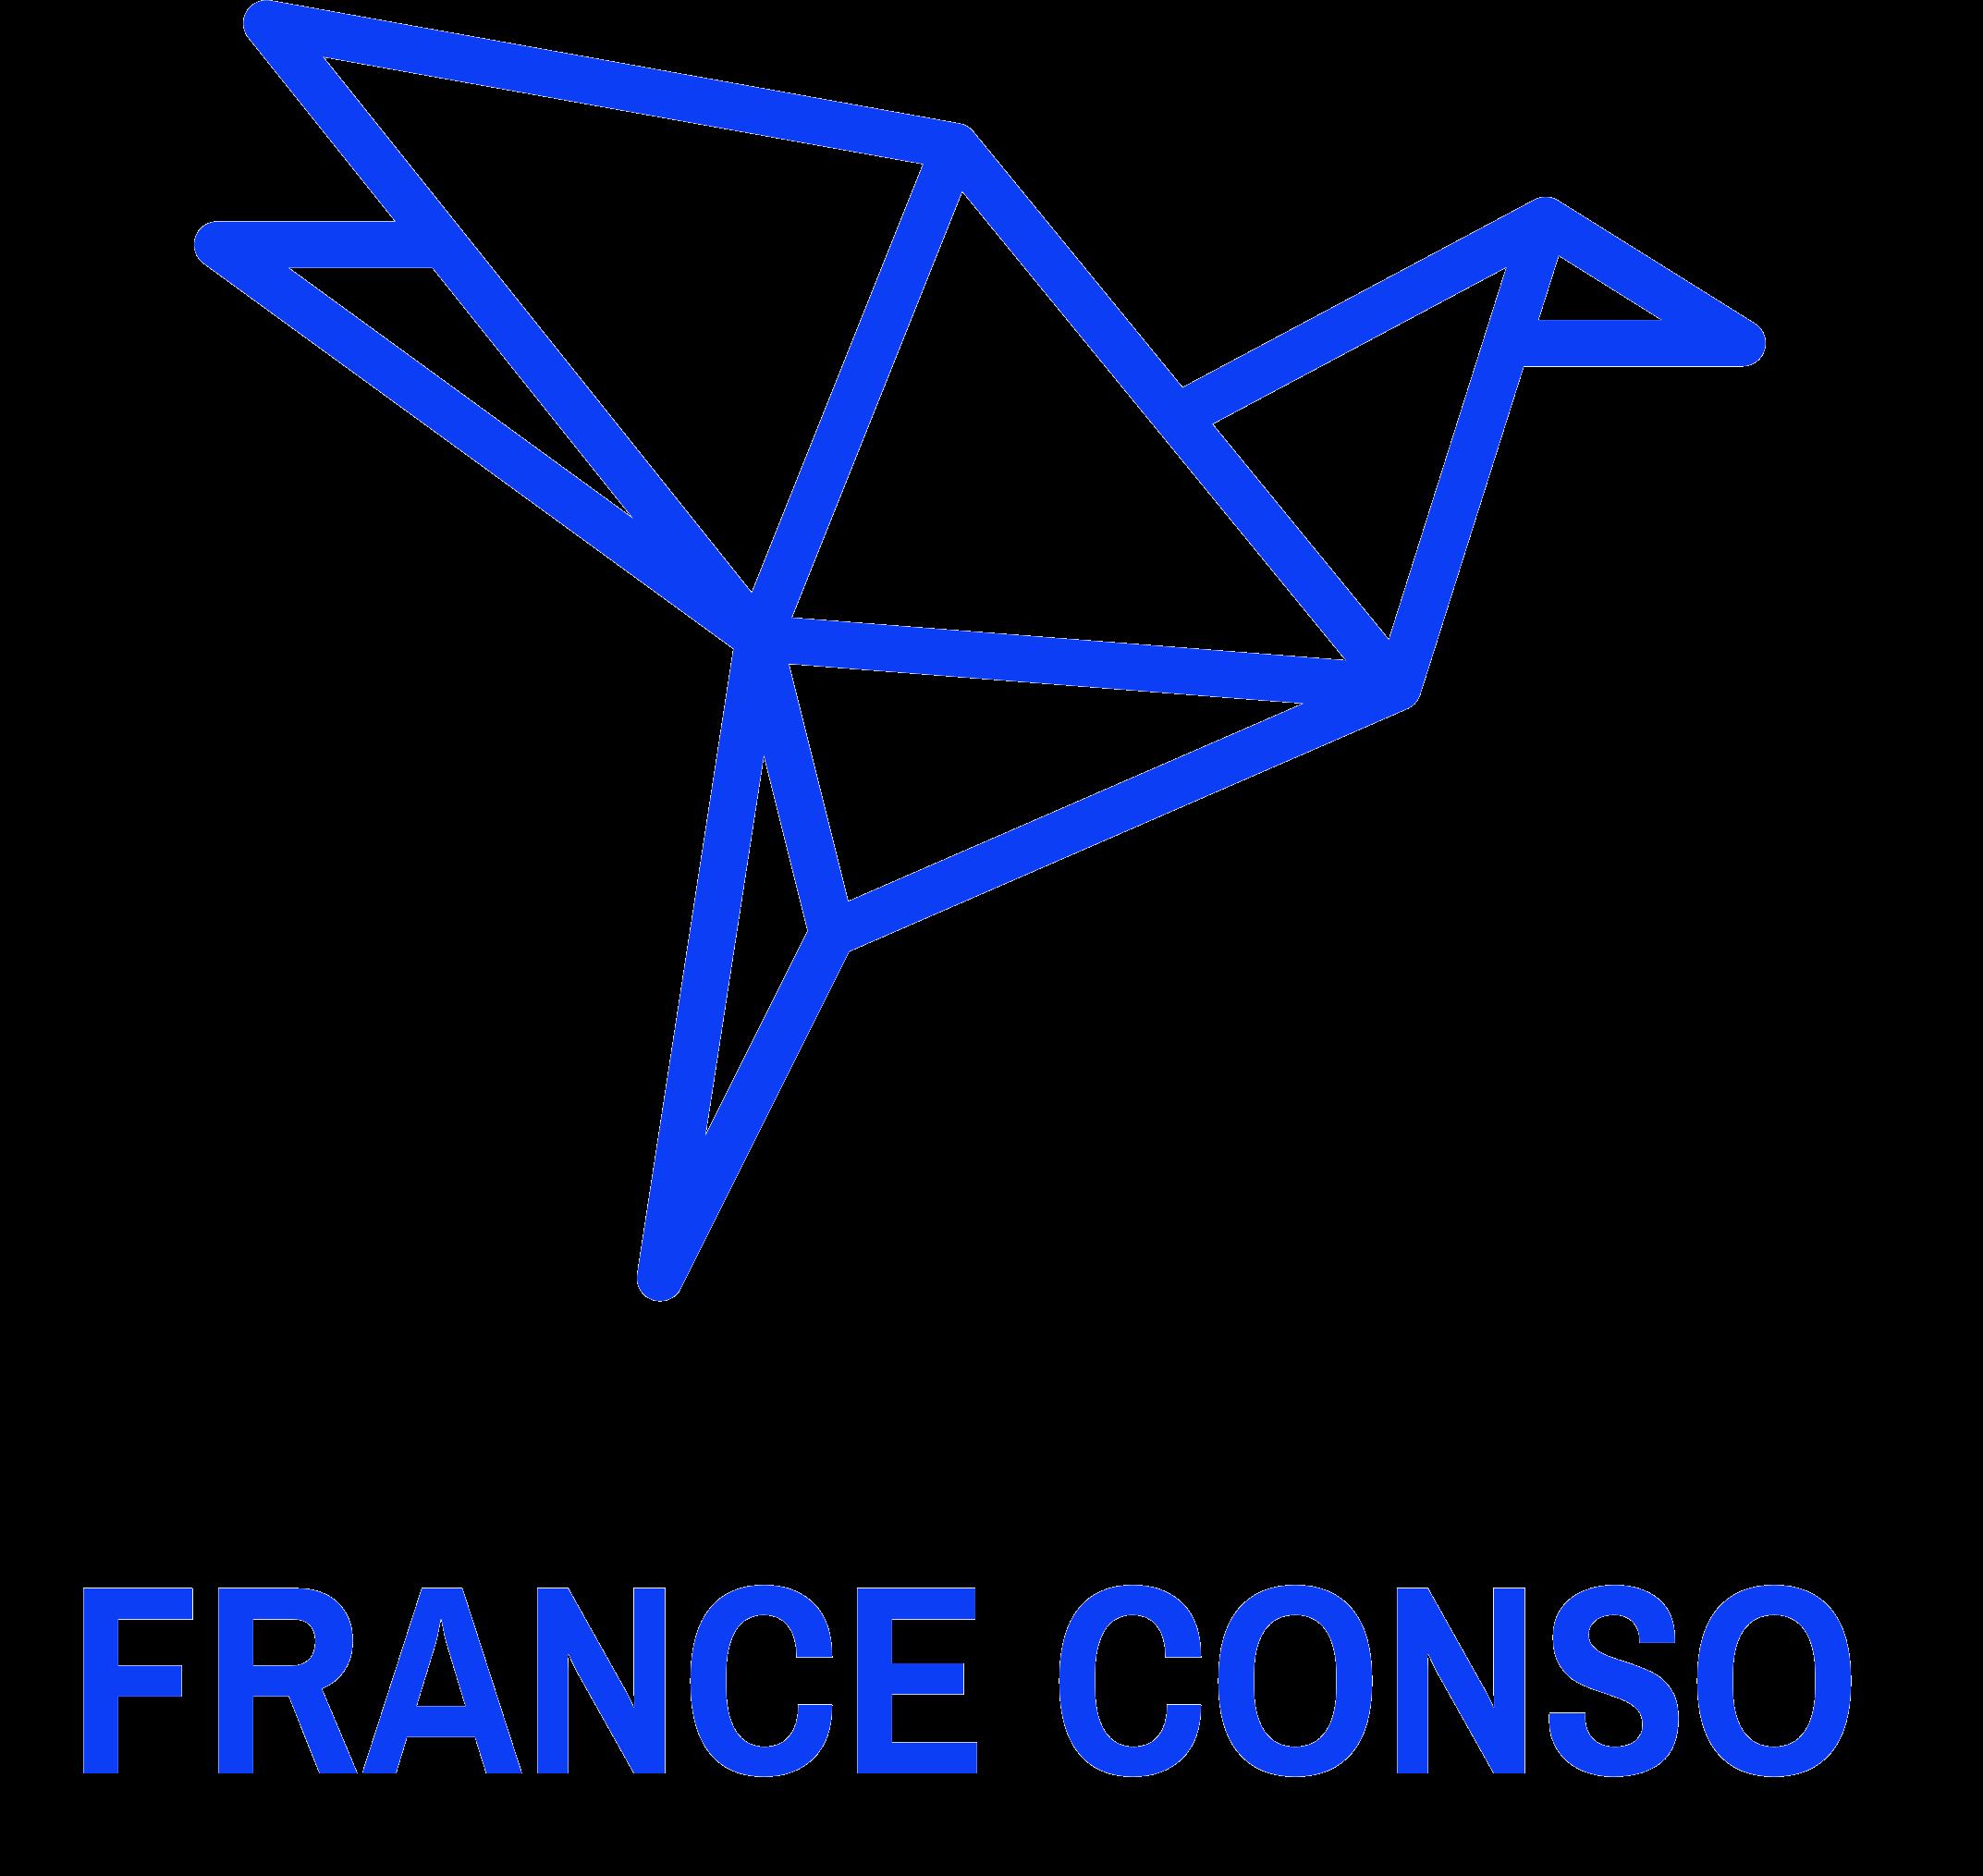 Logo France Conso